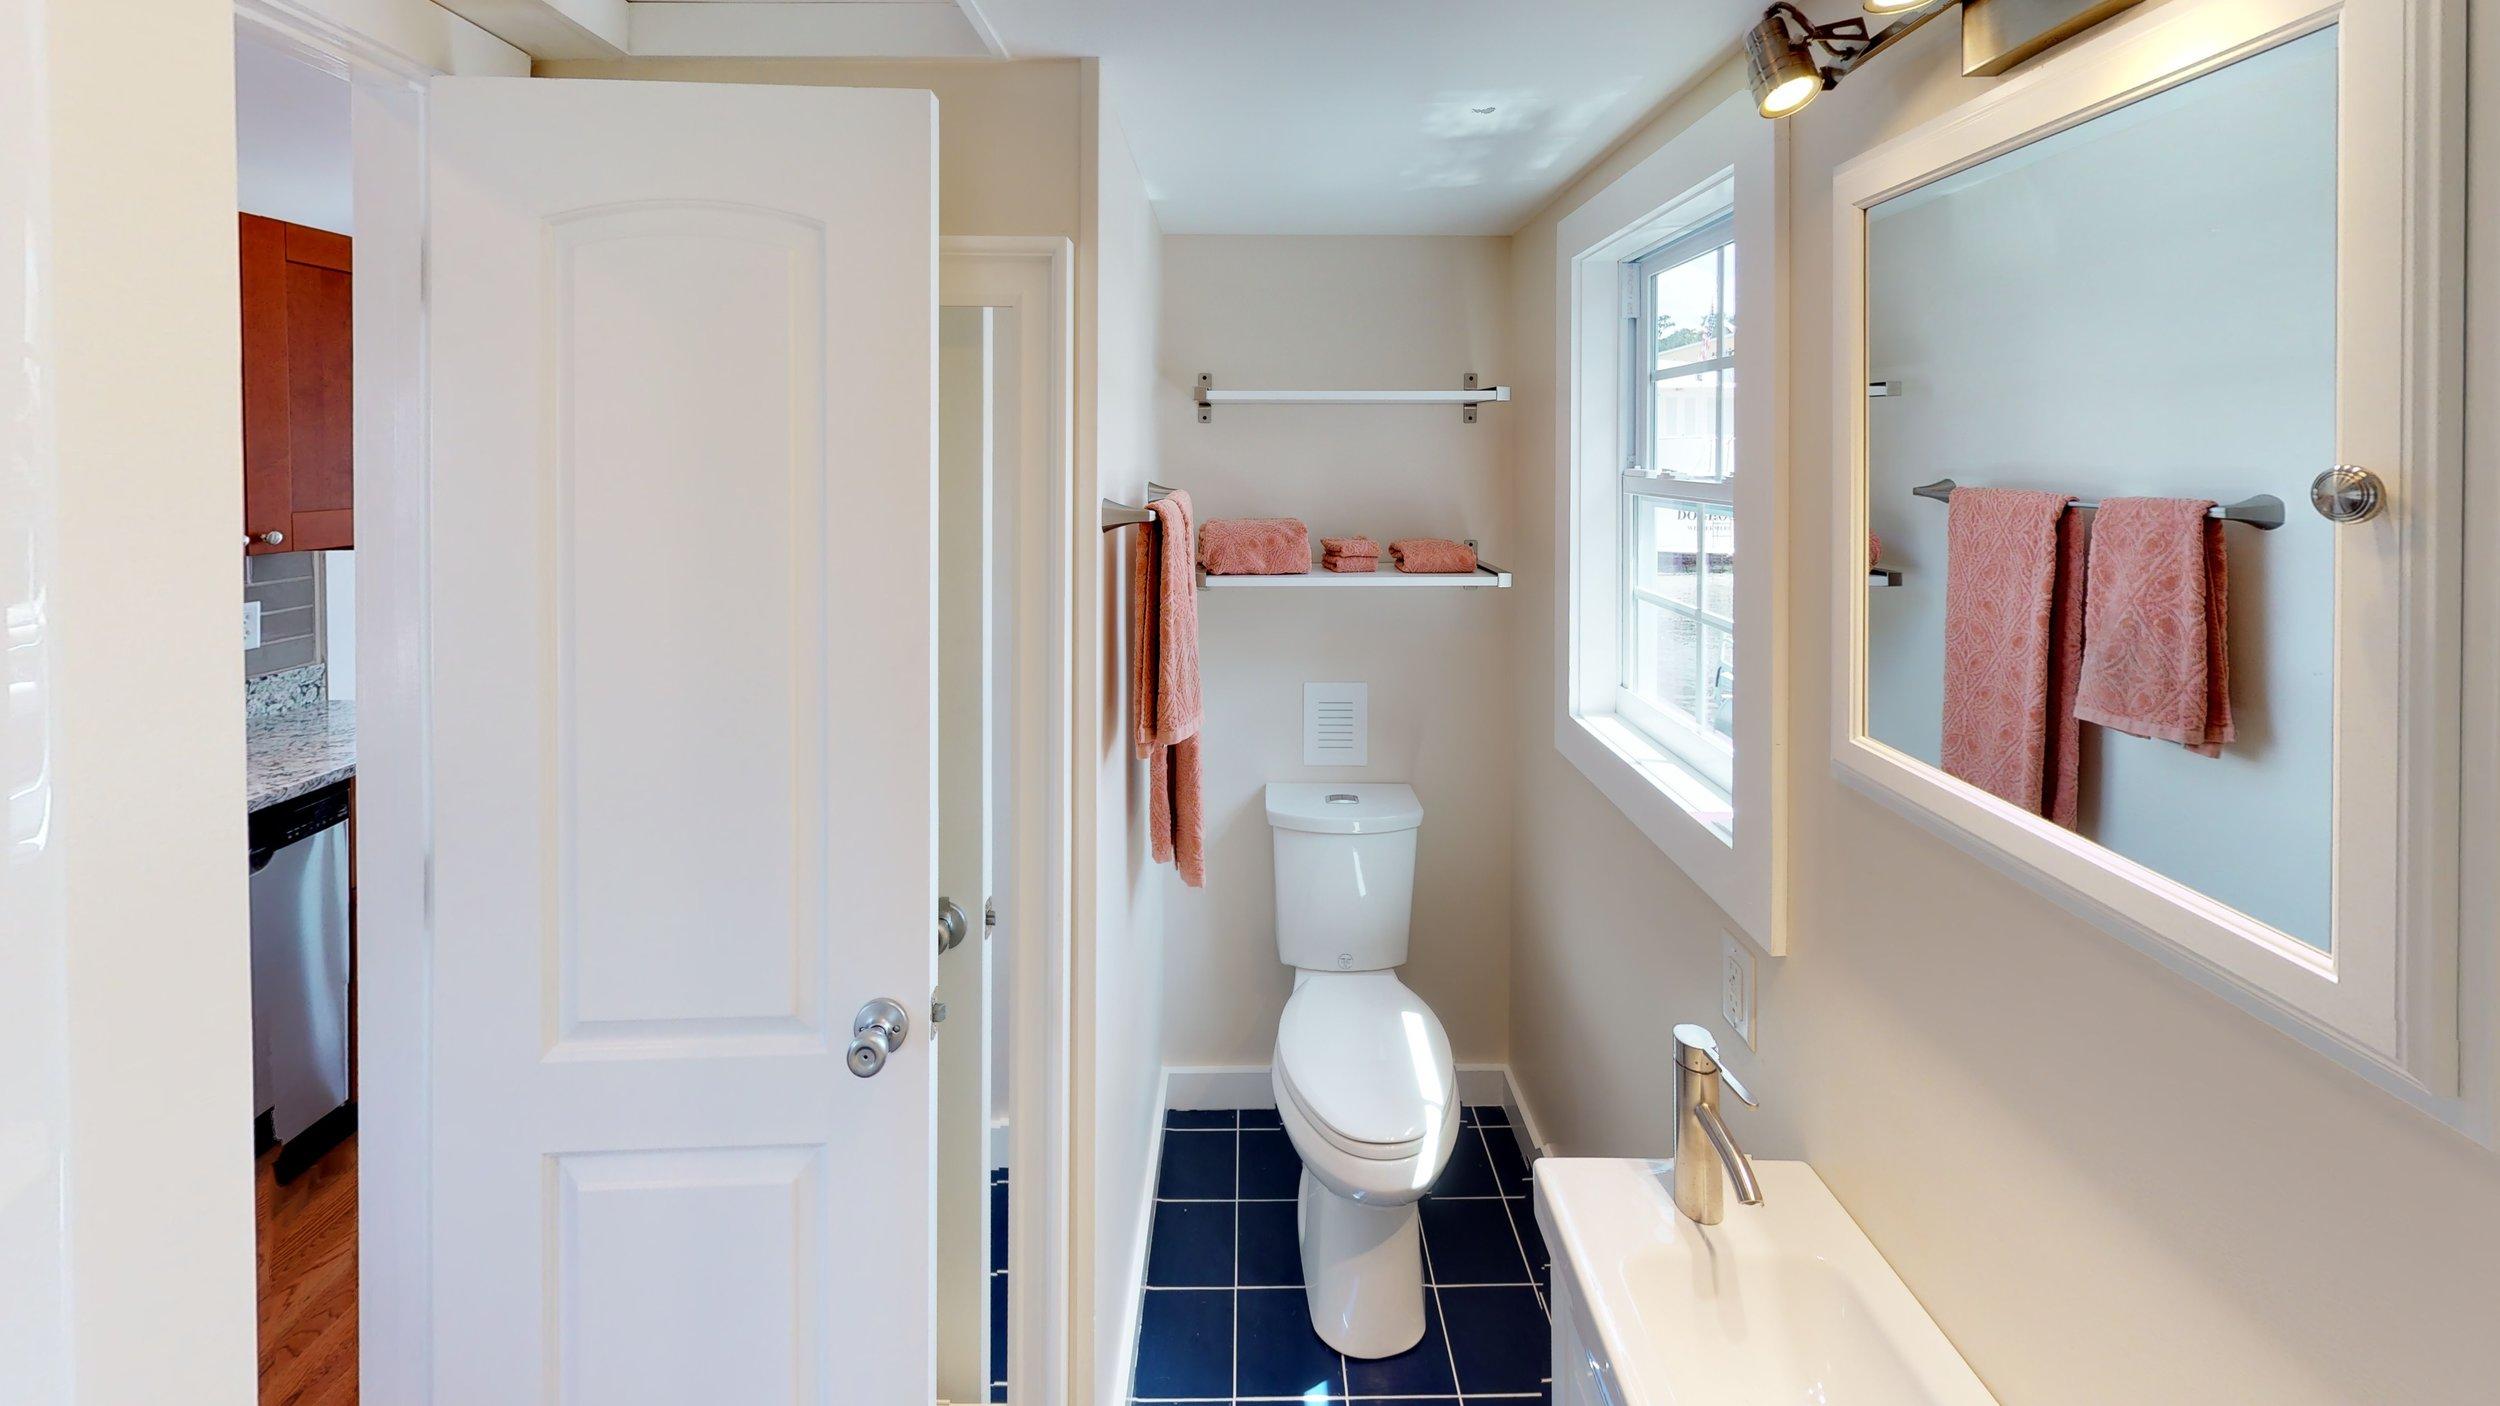 4370-Carraway-Place-Bathroom.jpg